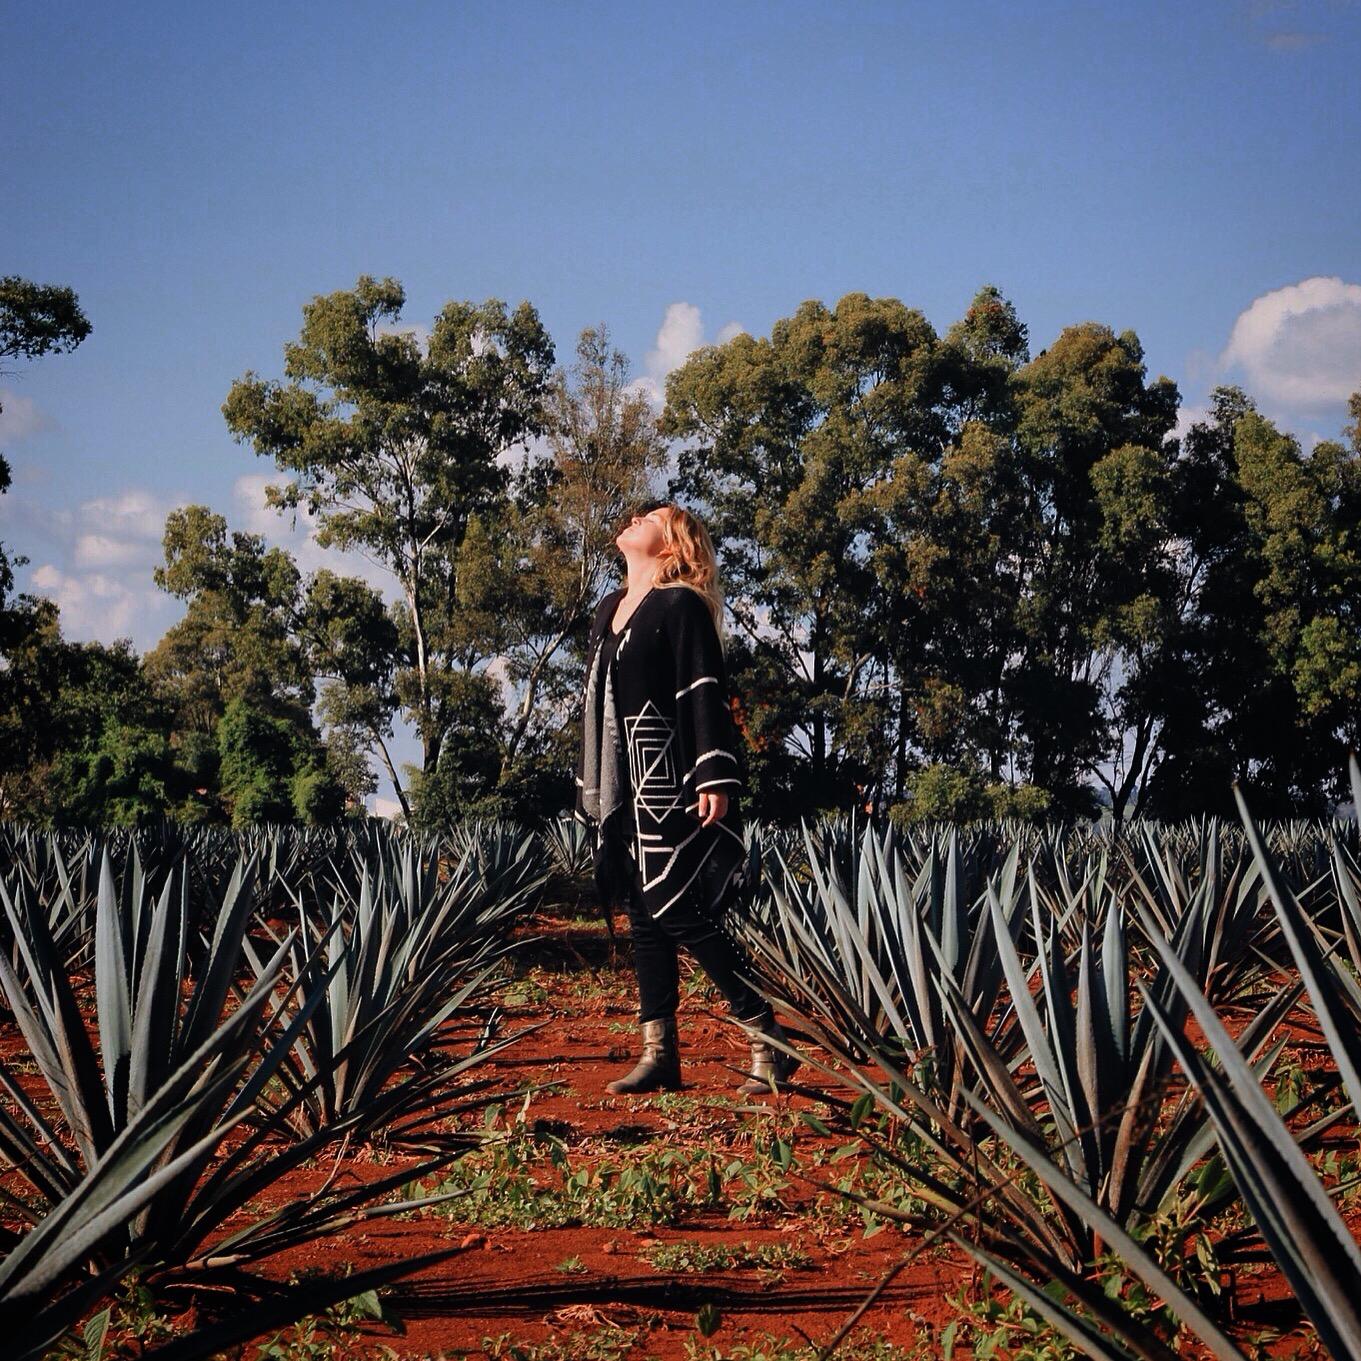 Tequila para la tribu